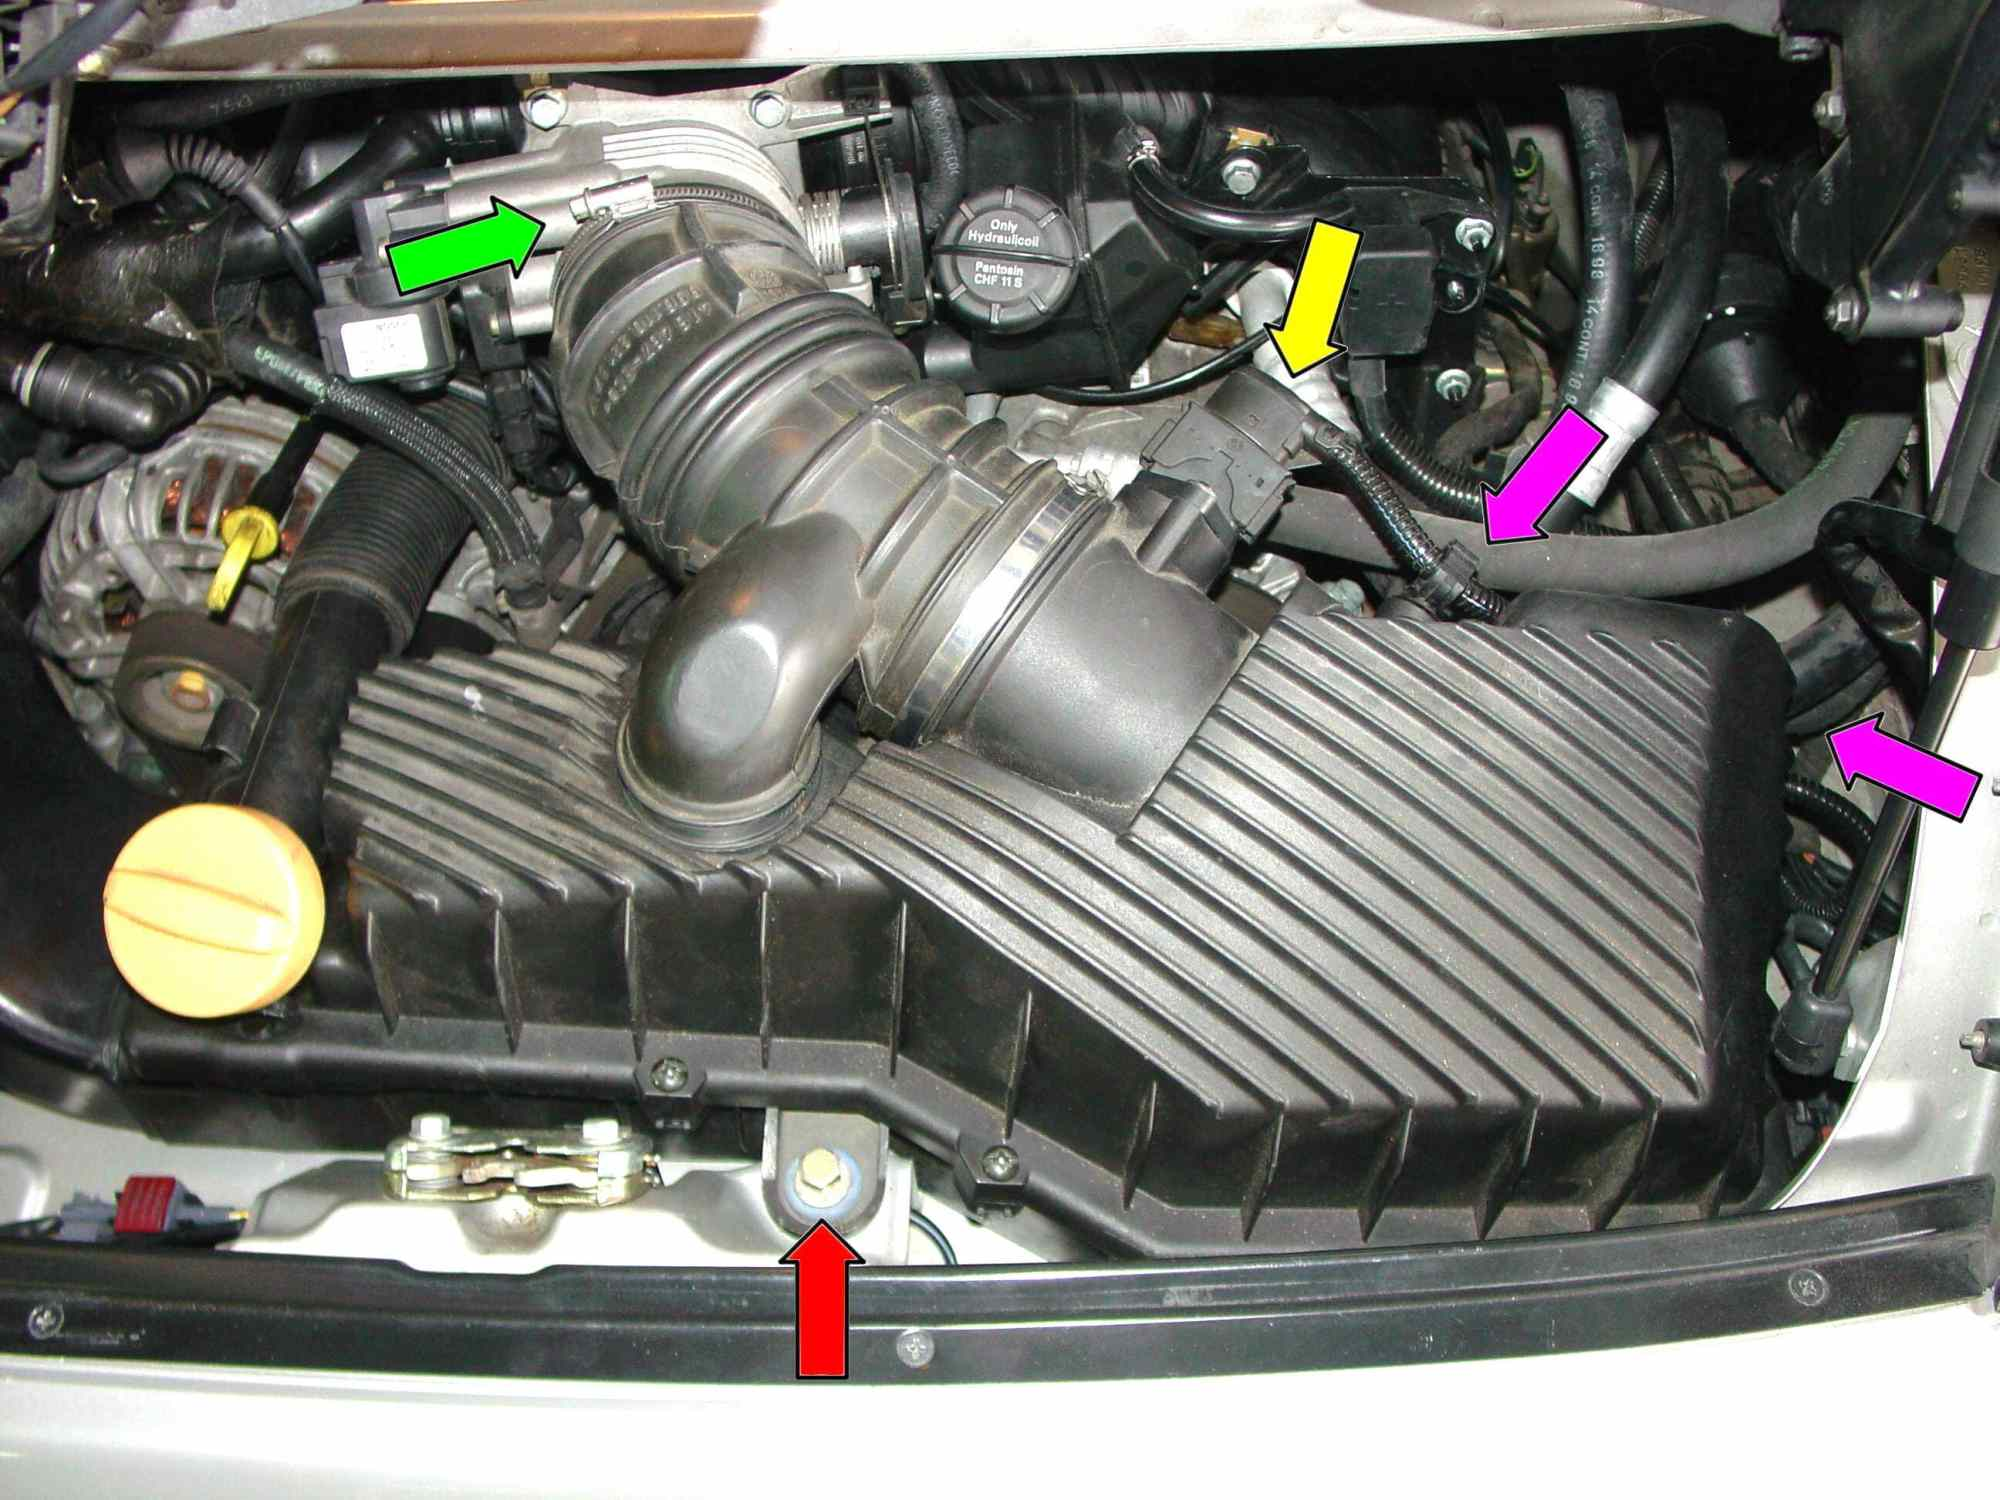 hight resolution of porsche 911 carrera engine mount replacement 996 1998 2005 997 mercedes motor mounts large